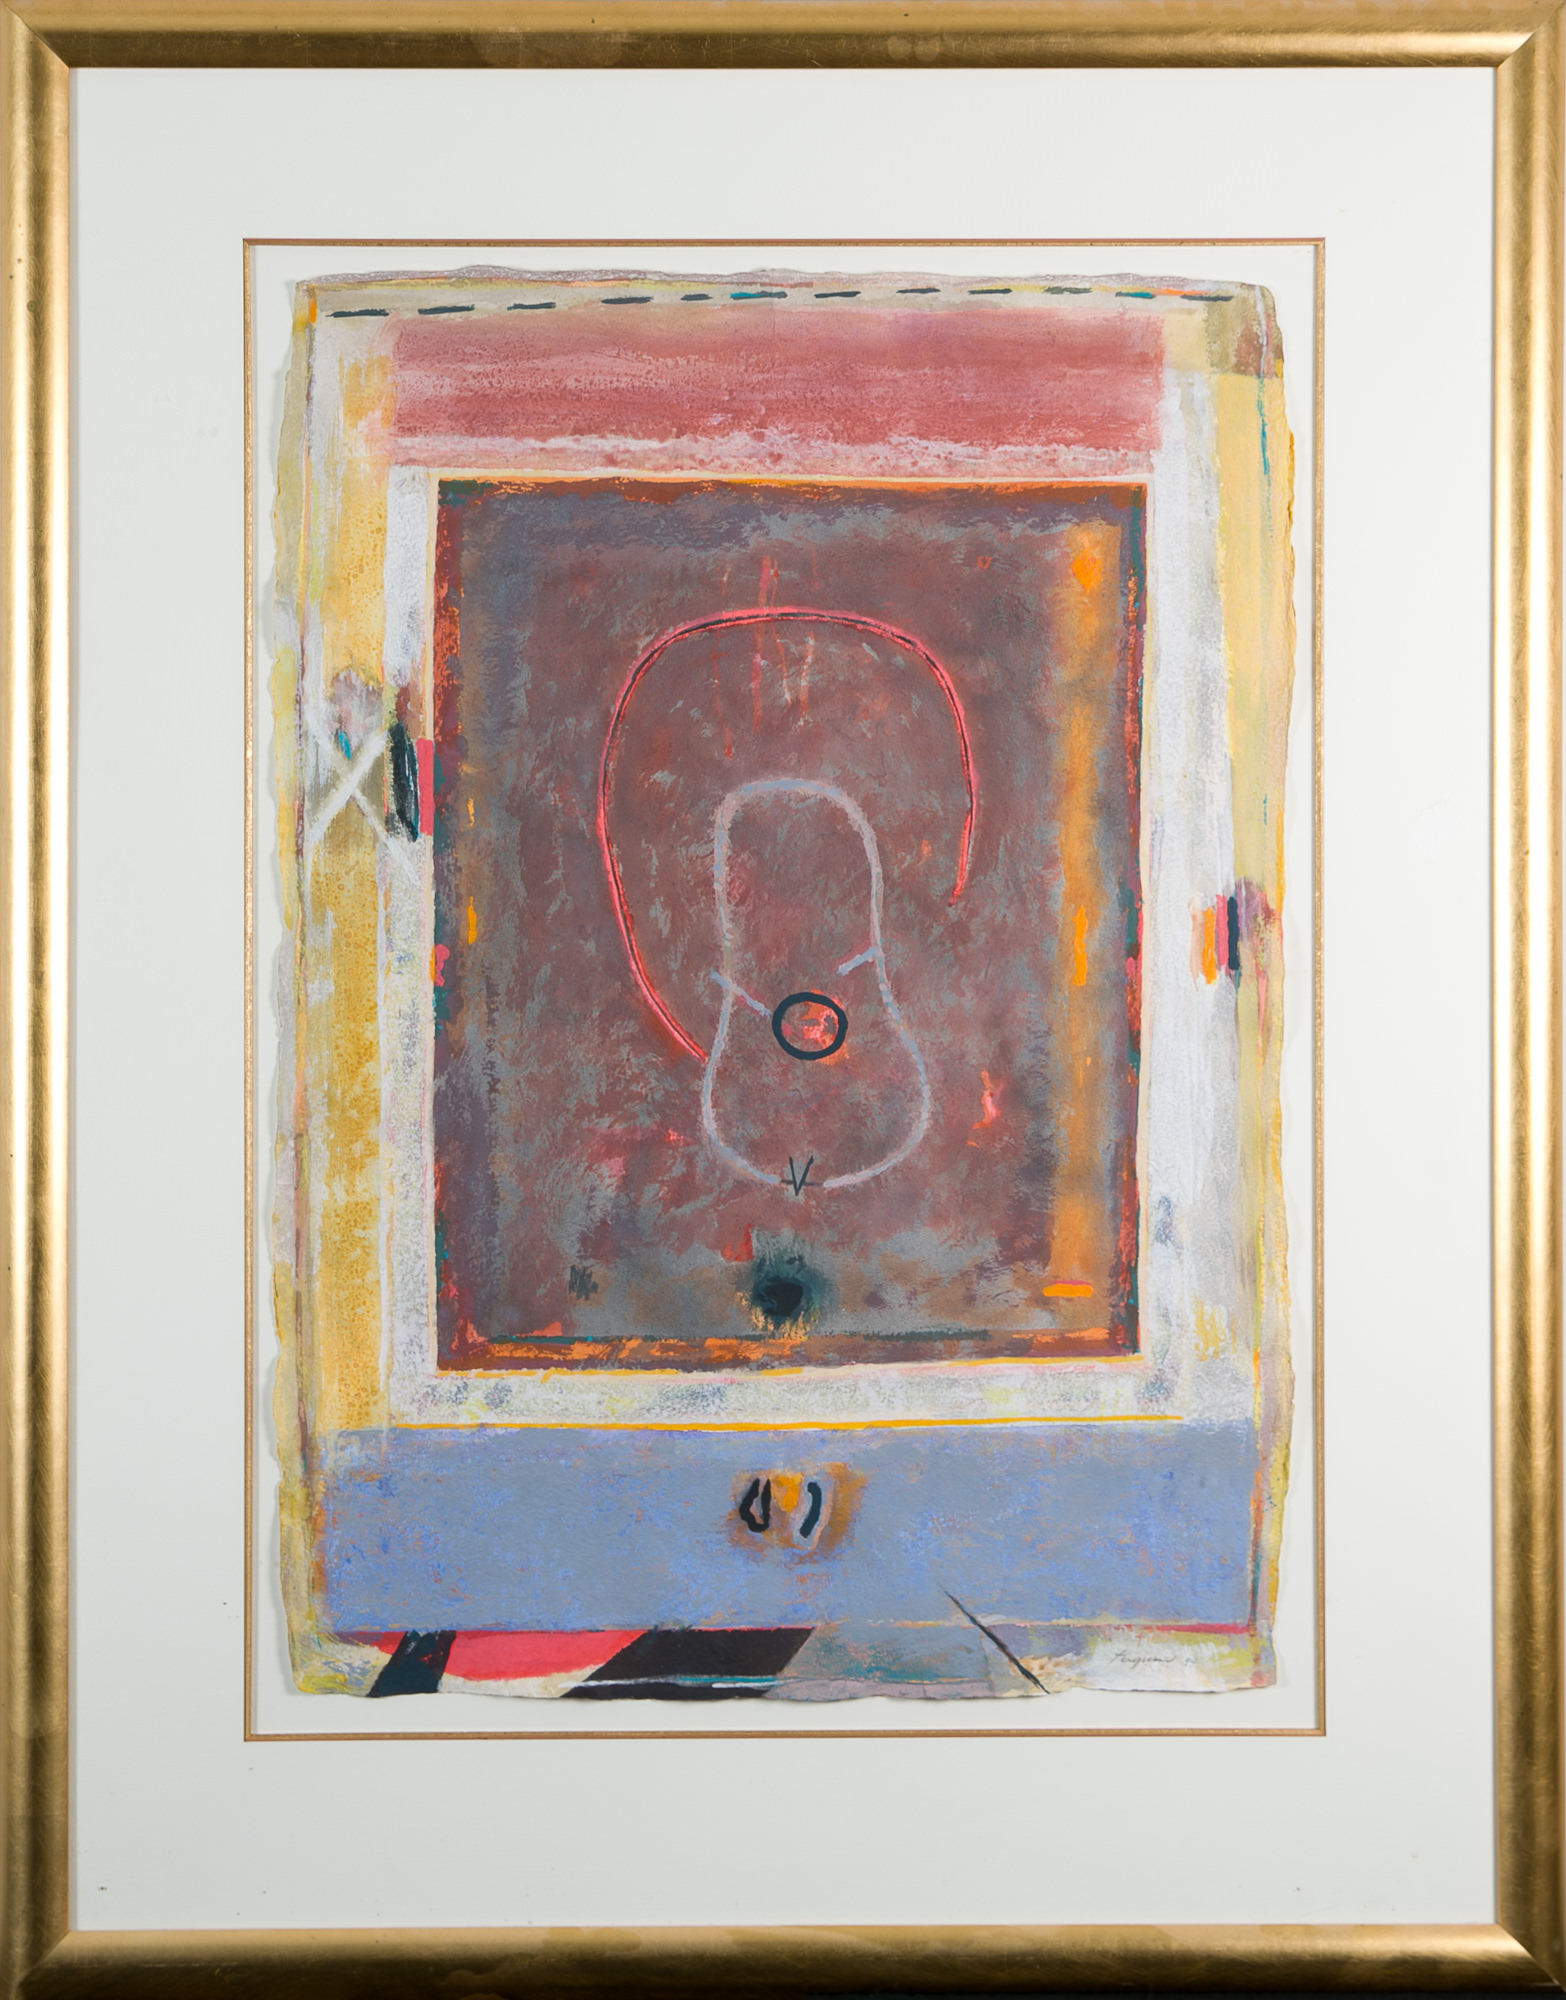 'Bill Ferguson (1932 -) Untitled, Mixed Media on Paper'